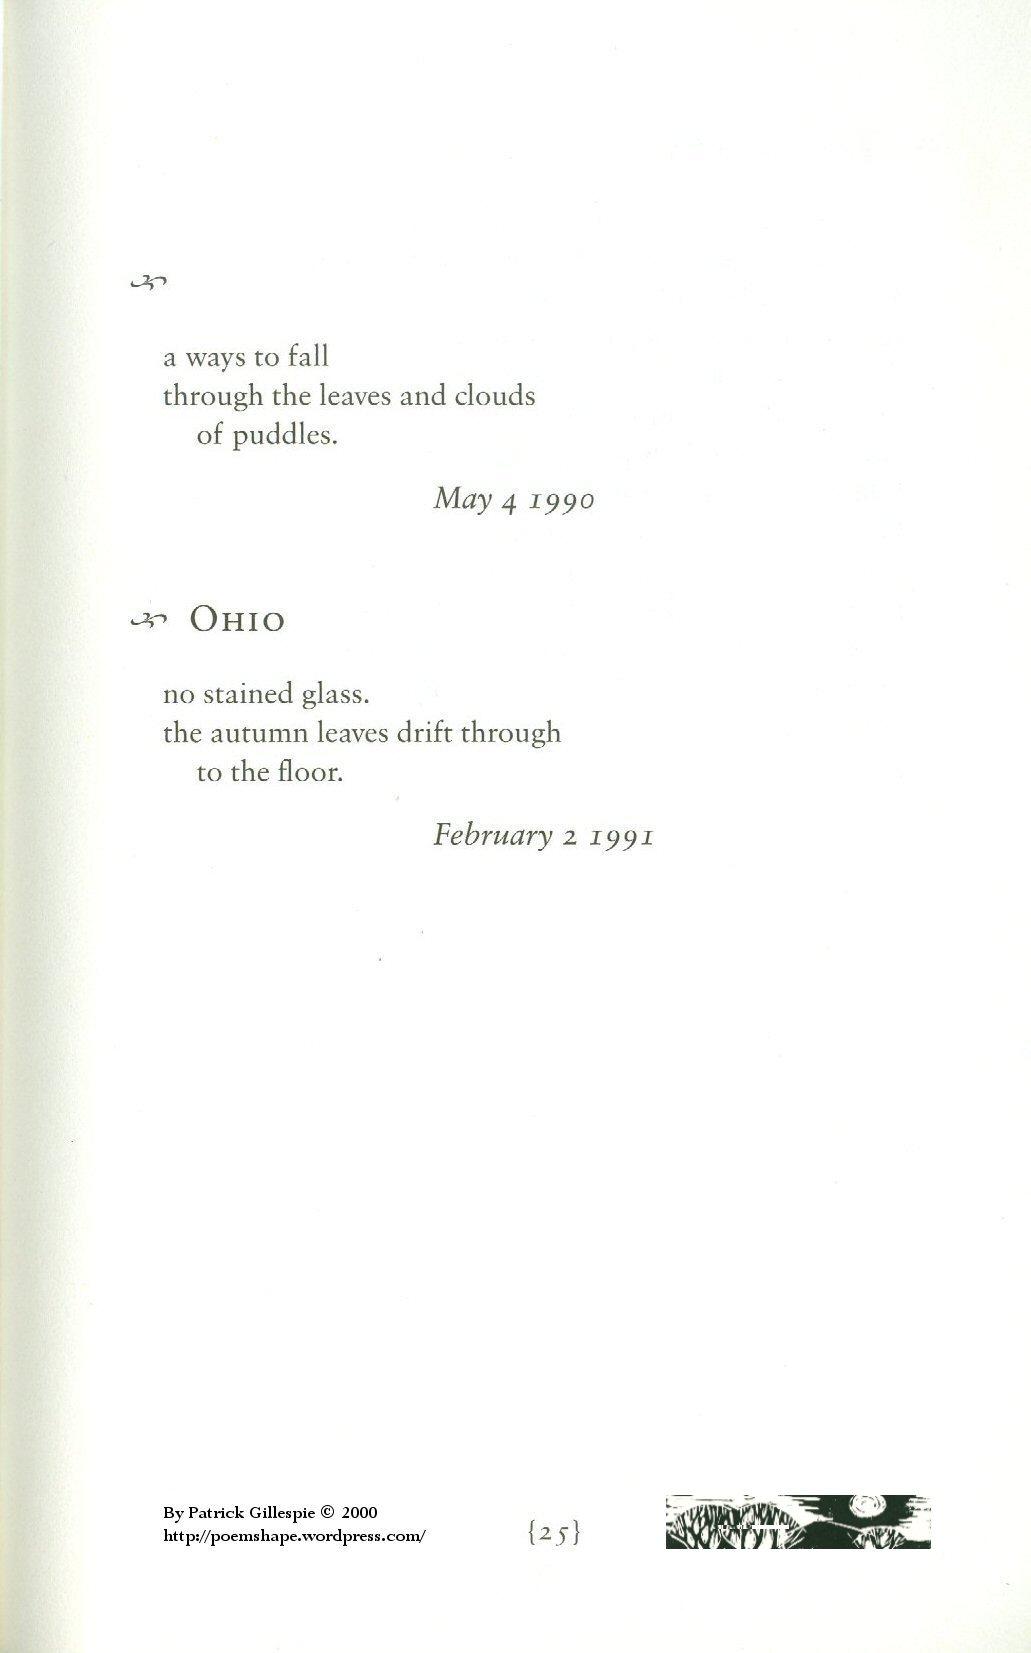 Page 25 - Two Haiku